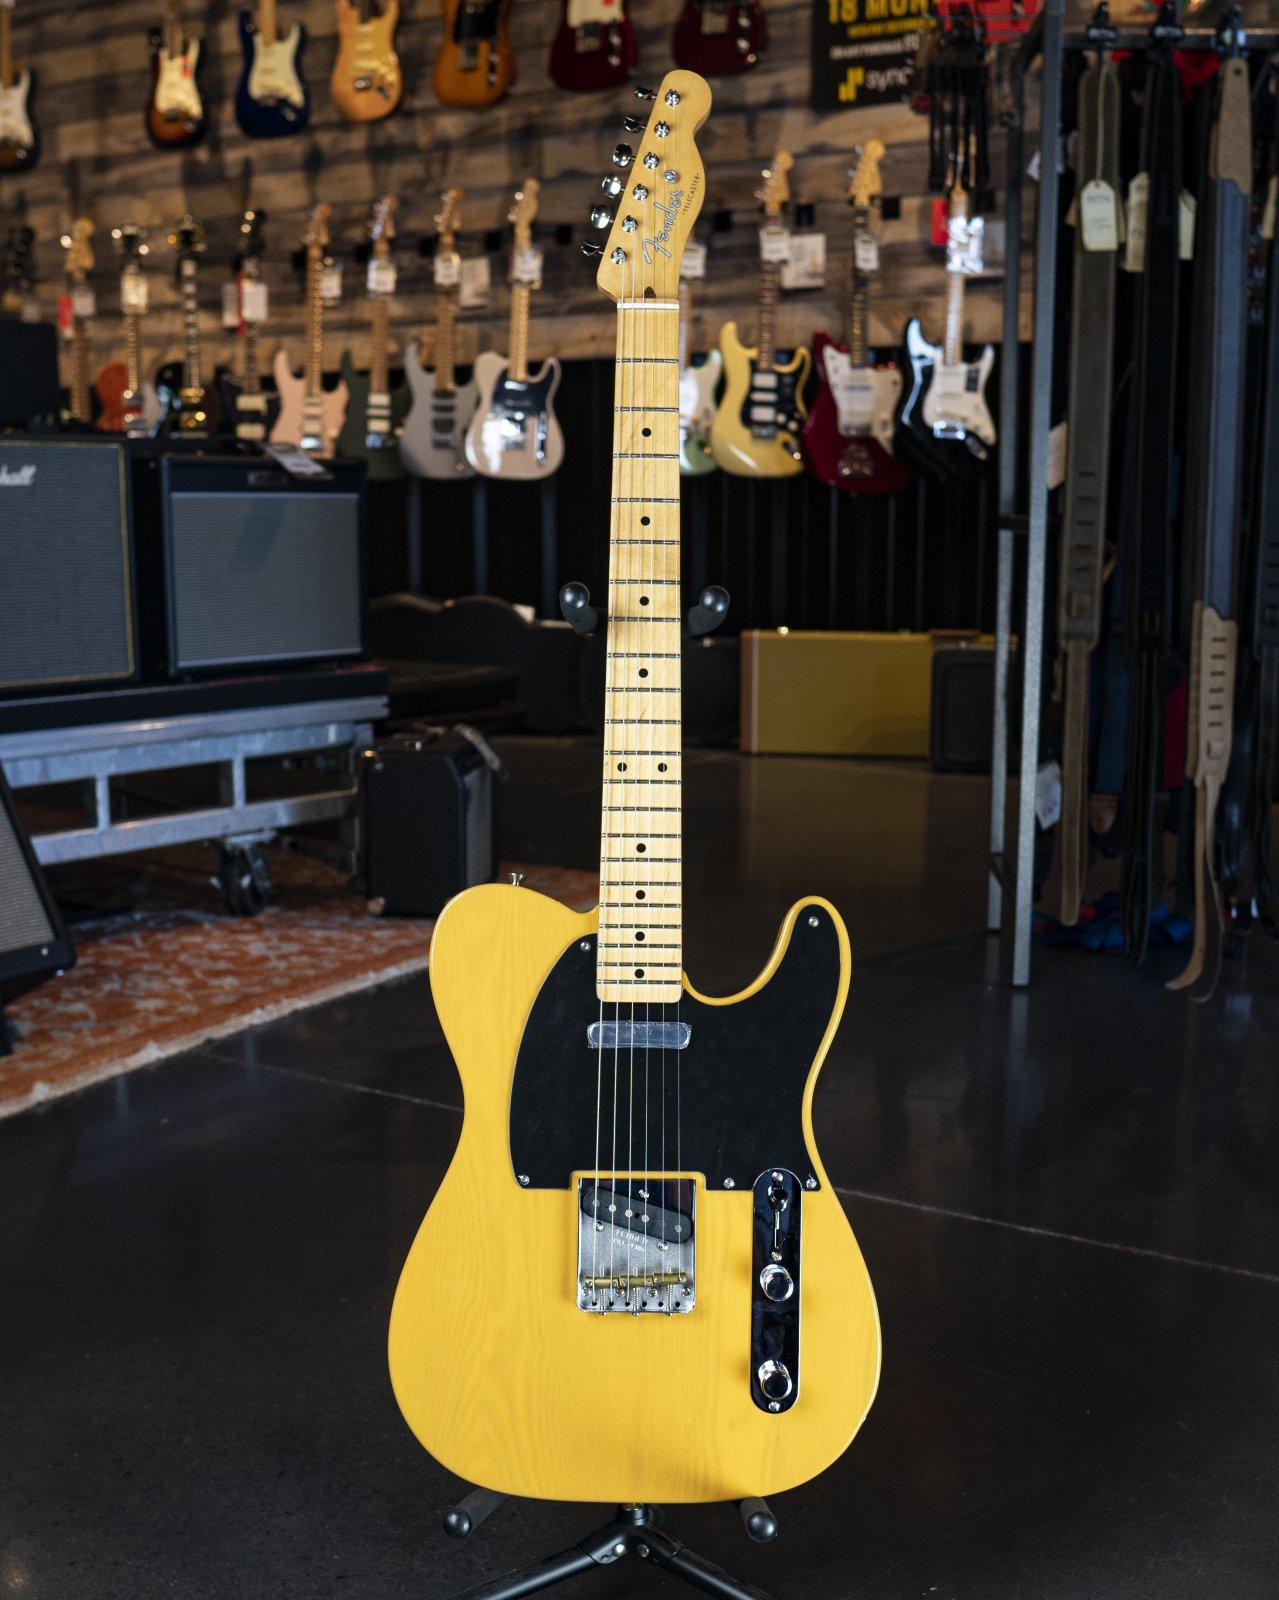 Fender Vintera '50s Telecaster Modified, Maple Fingerboard, Butterscotch Blonde